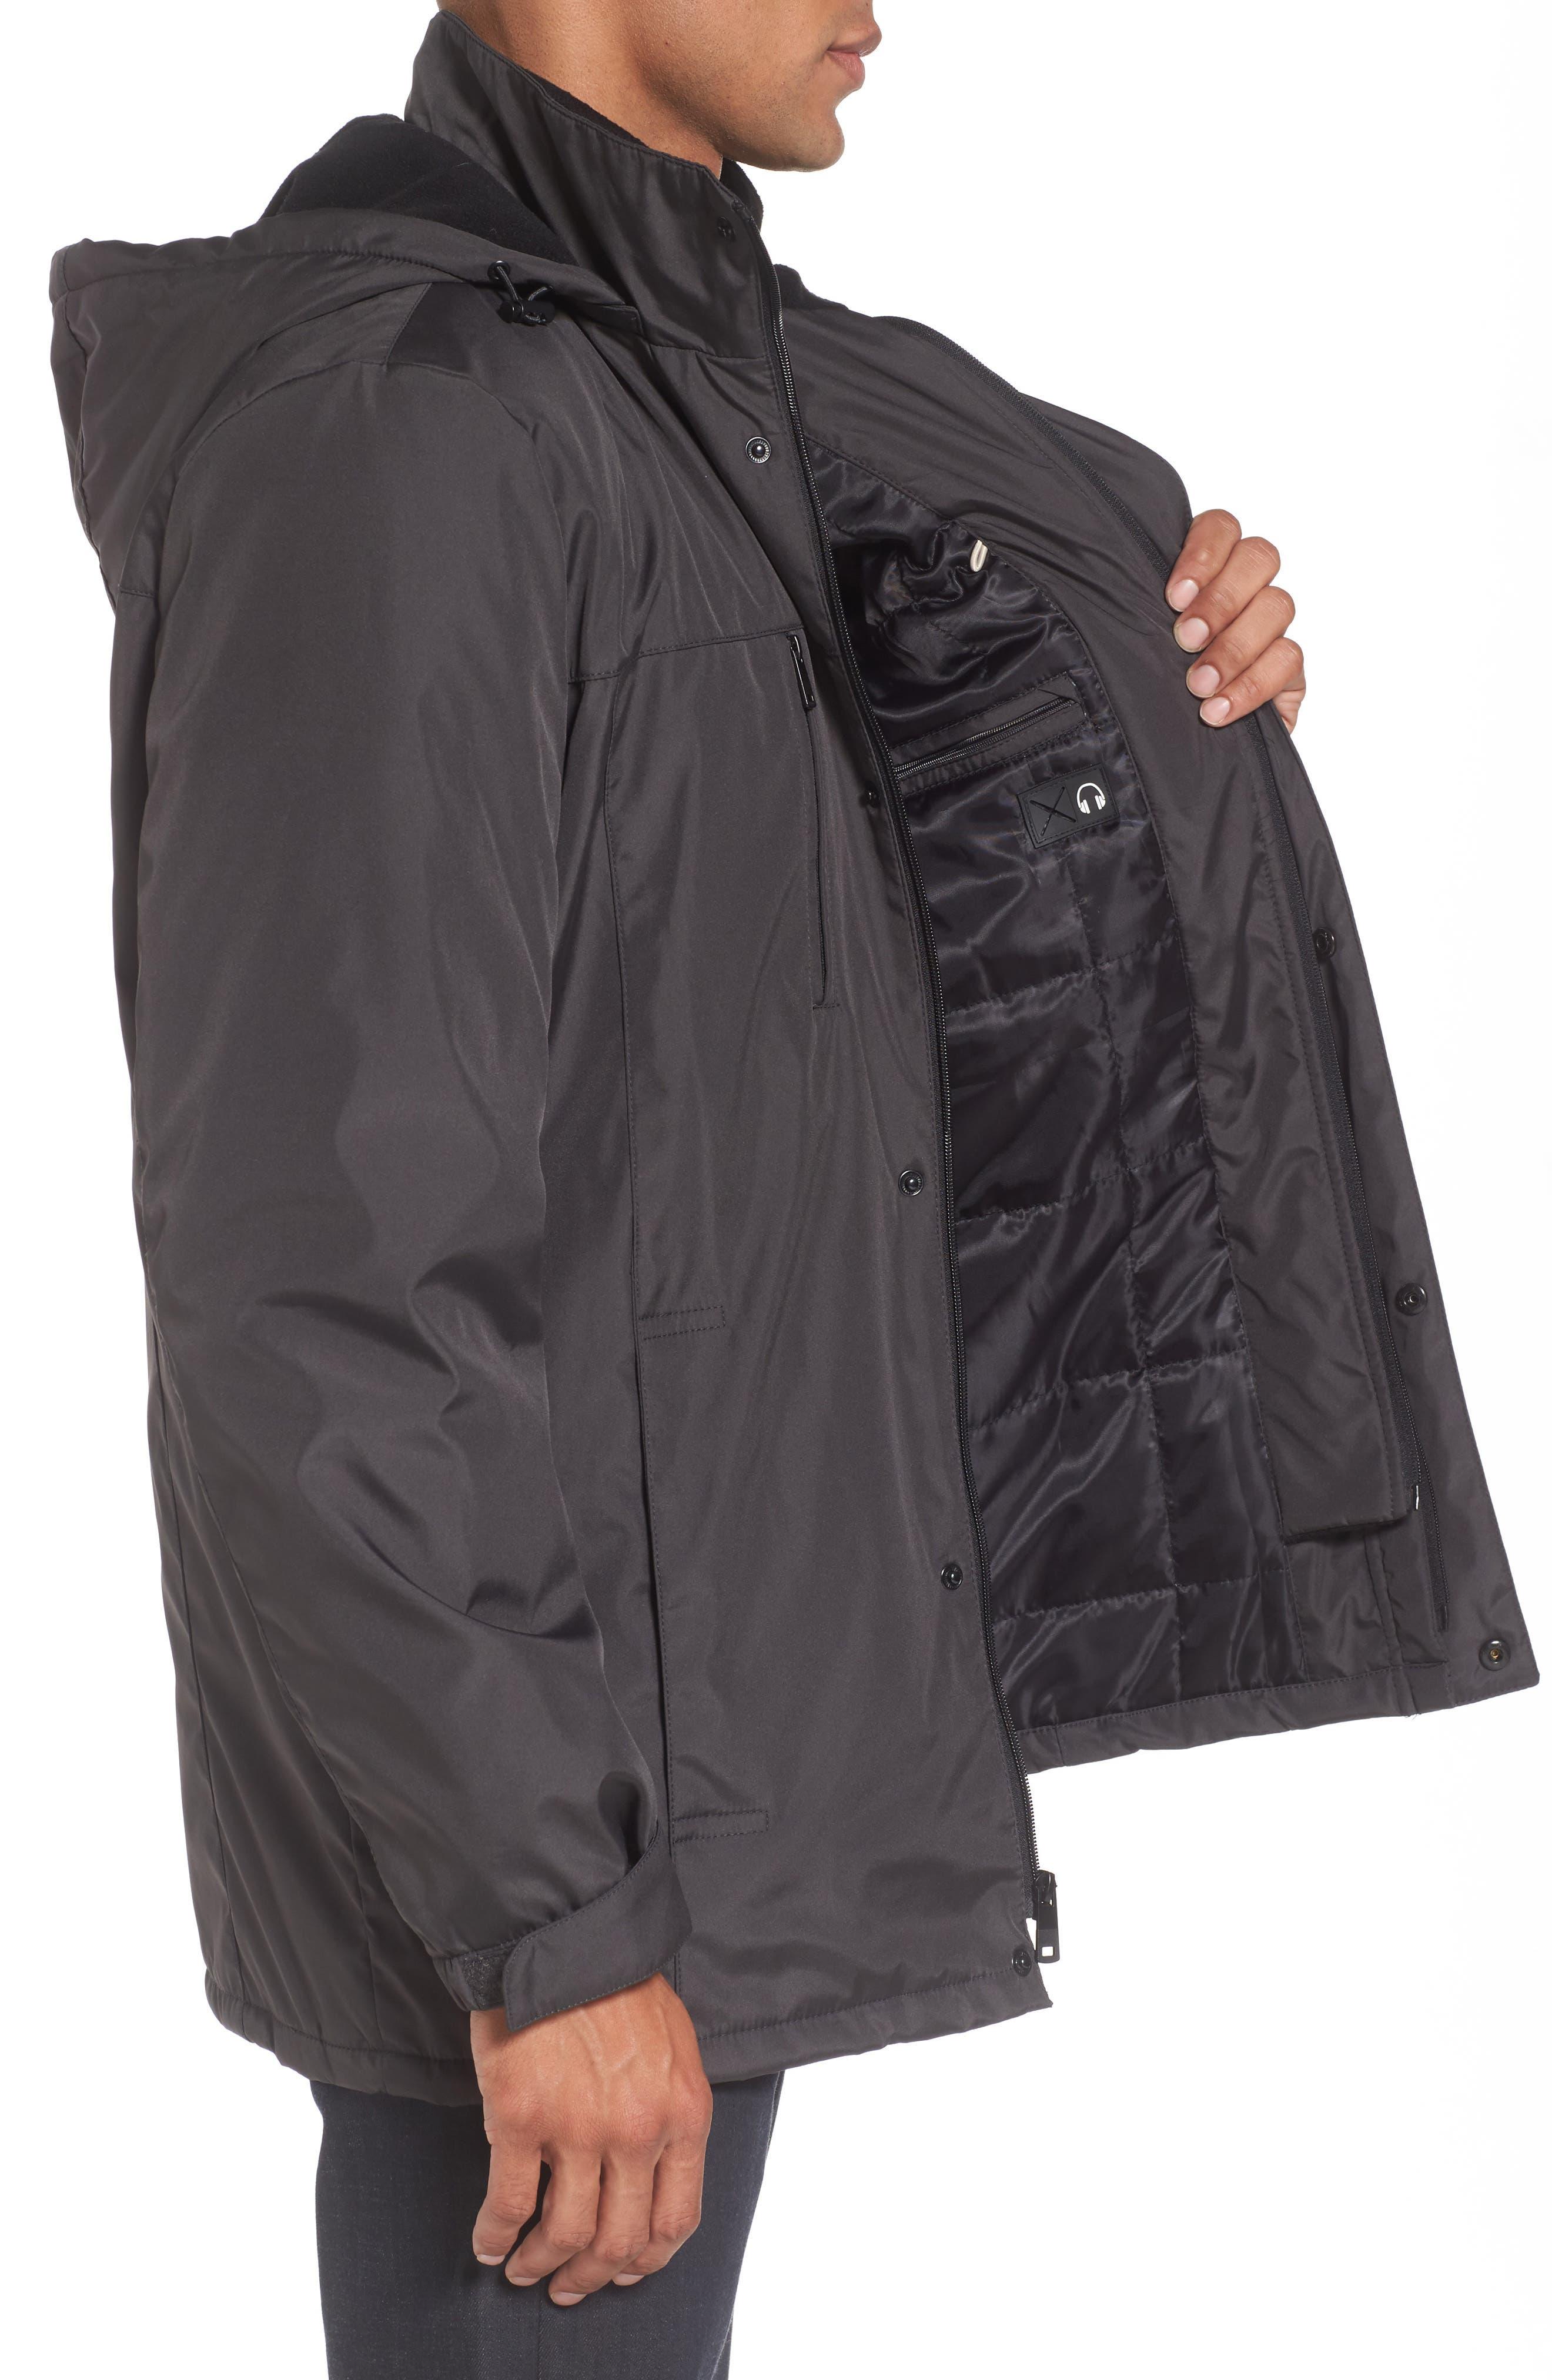 Hooded Jacket with Inset Fleece Bib,                             Alternate thumbnail 10, color,